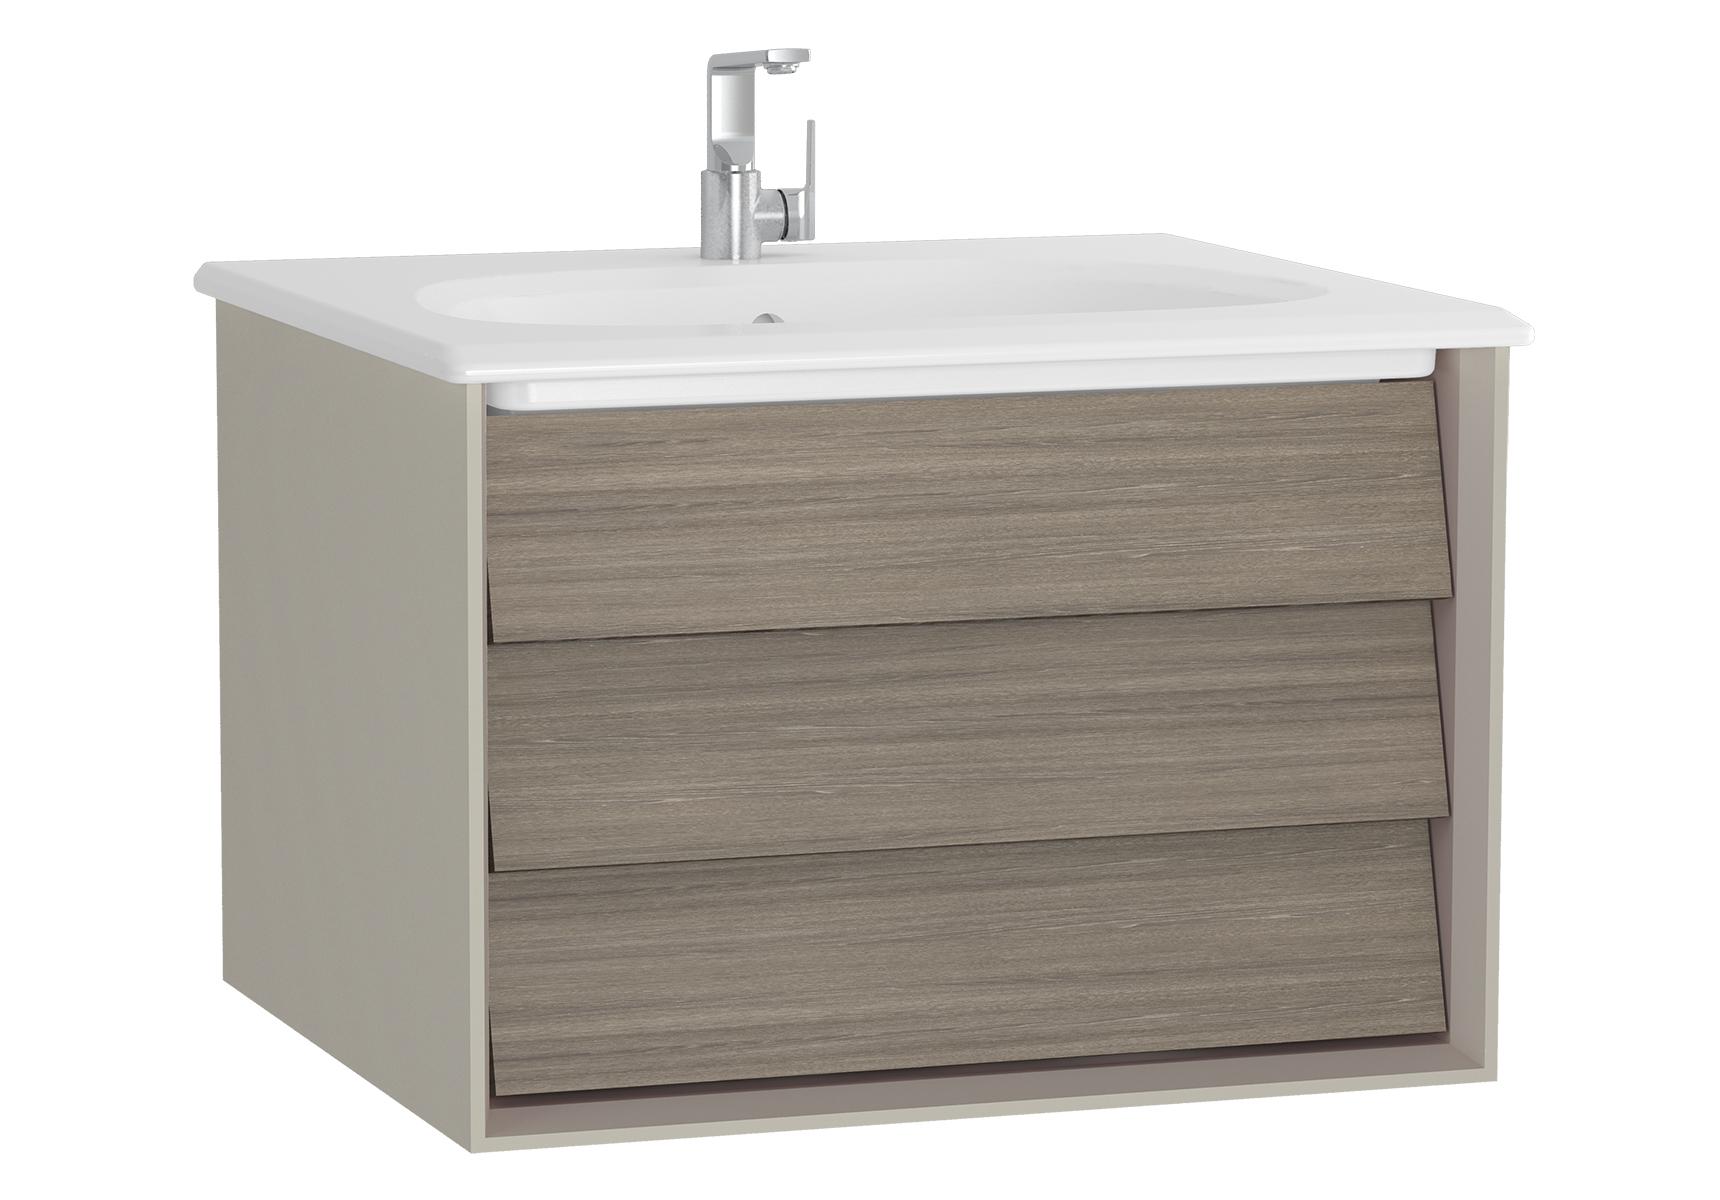 Frame meuble avec plan céramique, 62,5 cm, chêne moka, mat taupe, avec blanc plan céramique